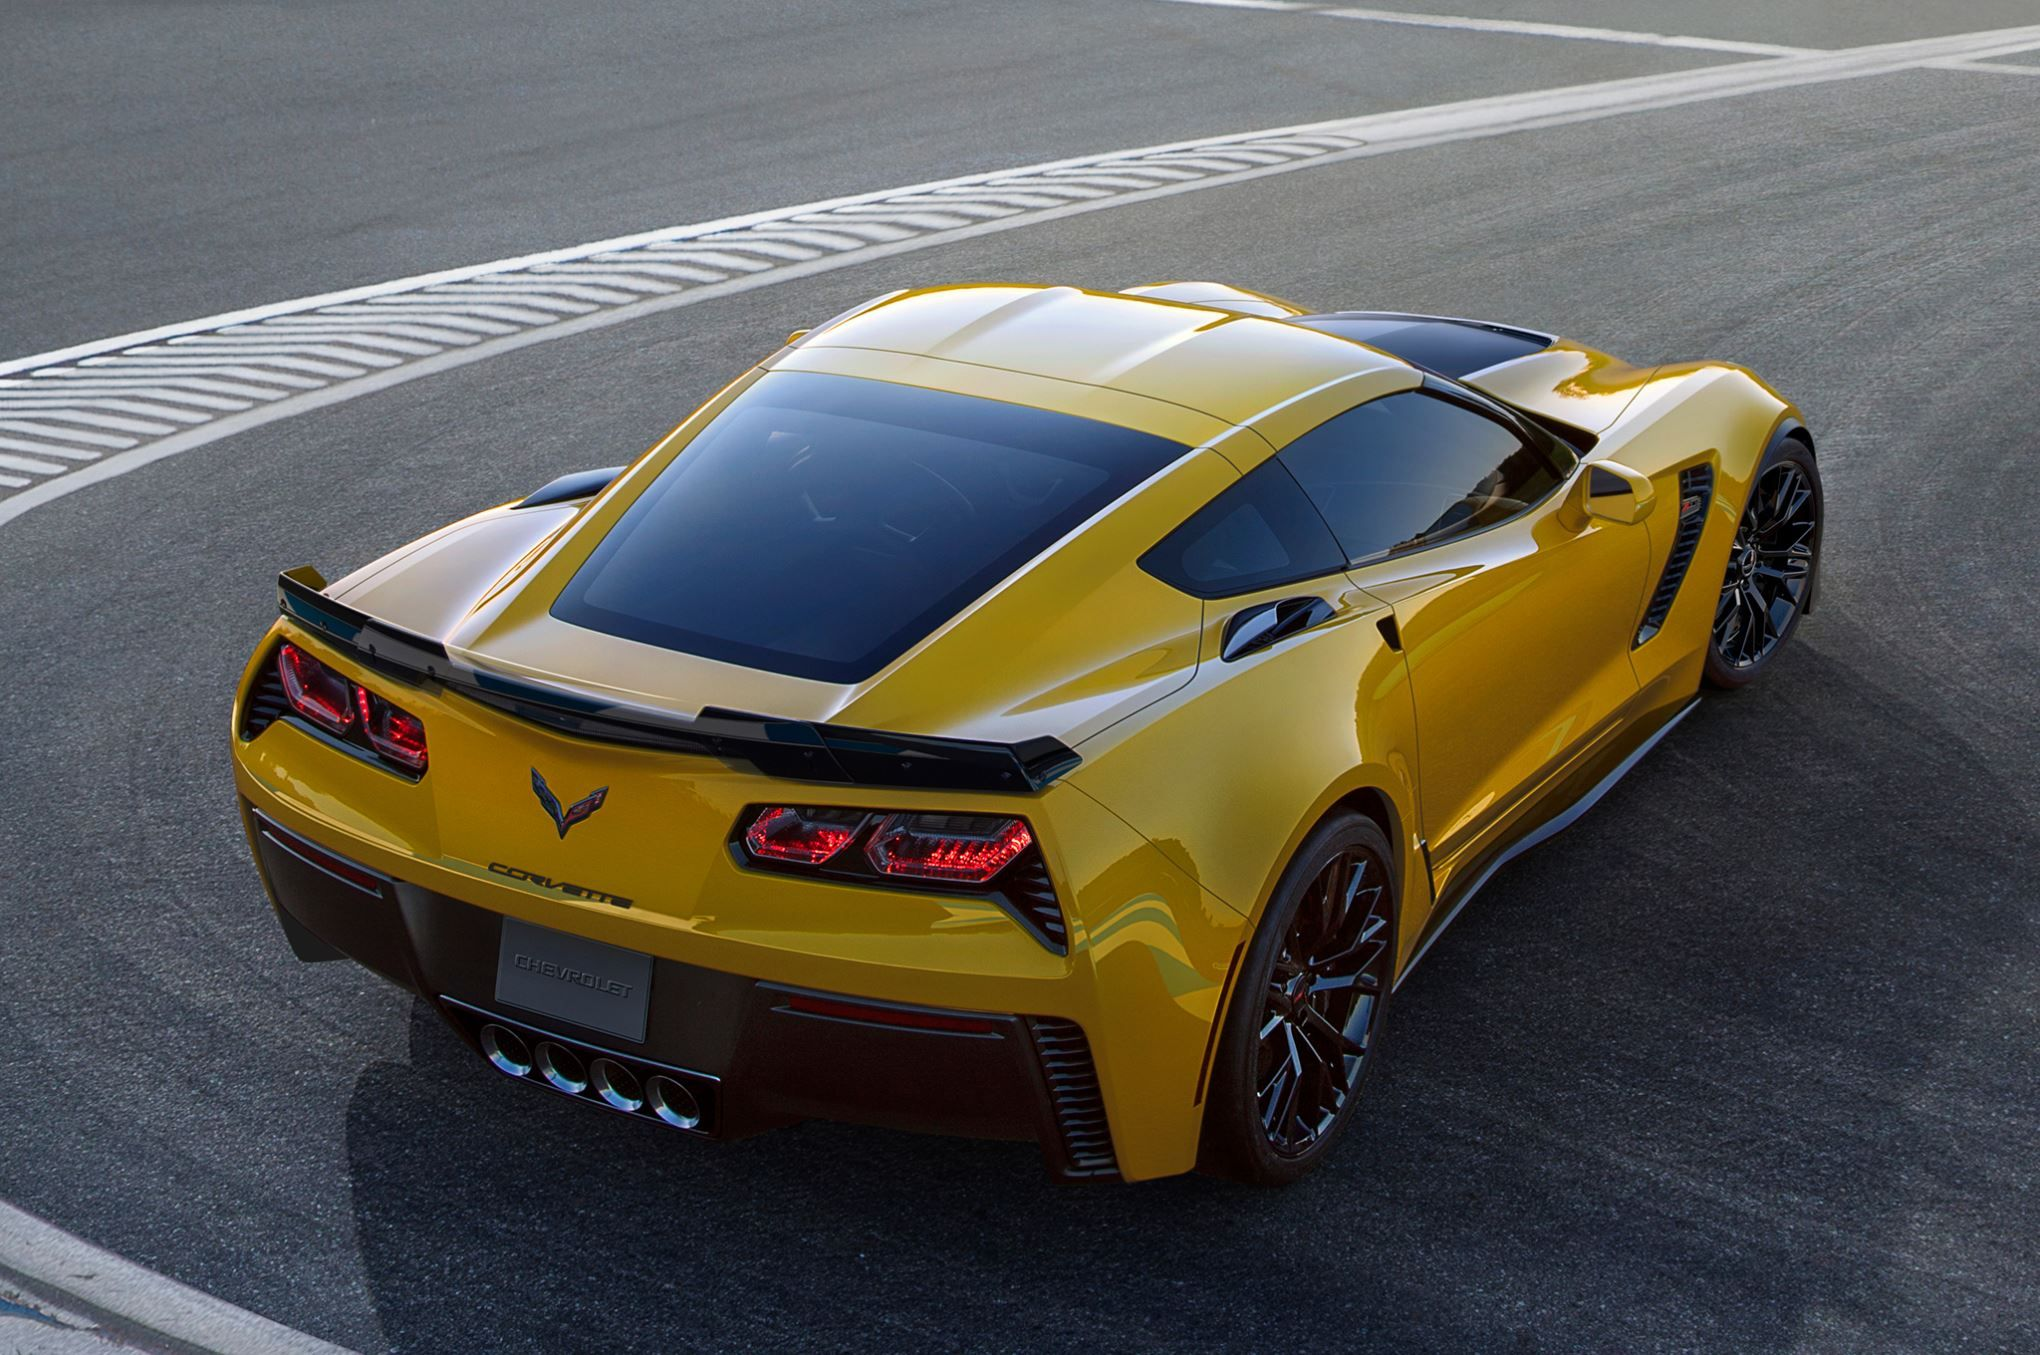 2015 Chevrolet Corvette Z06 Hits 60 Mph In 2 95 Seconds Chevrolet Corvette Z06 Chevrolet Corvette Corvette Z06